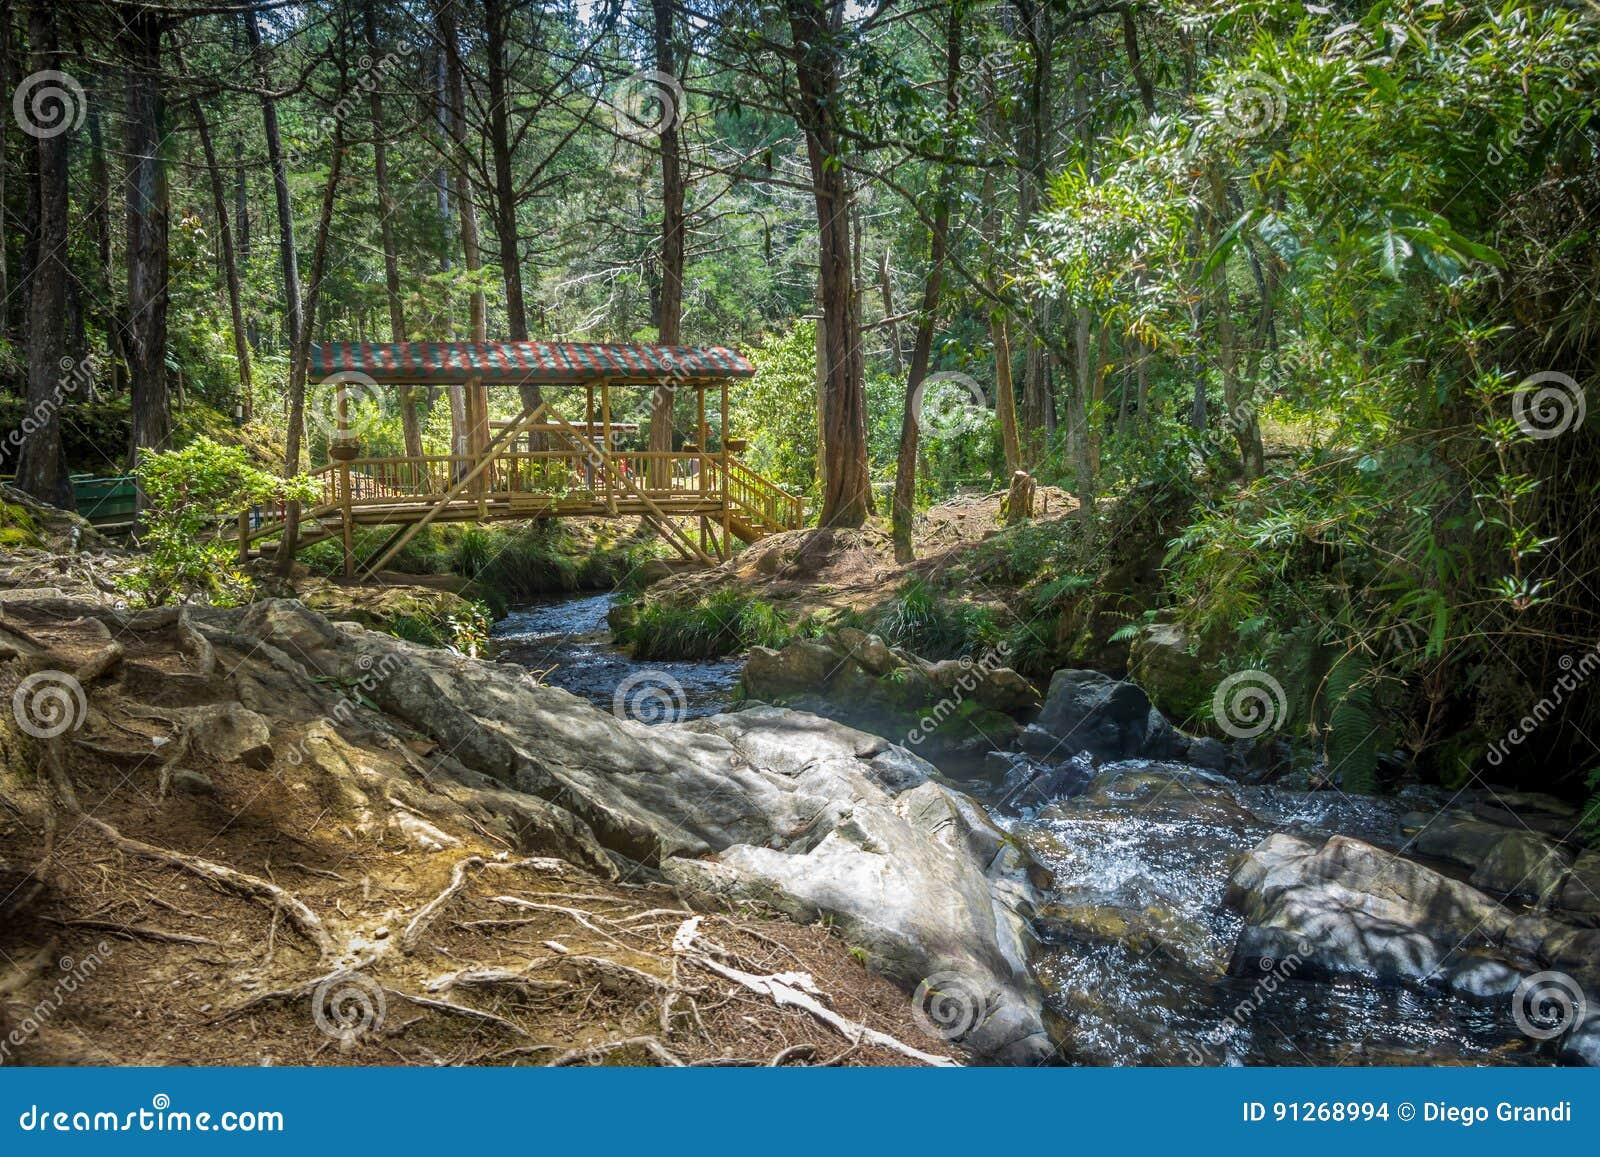 Ponte de madeira coberta colorida pequena - Parque Arvi, Medellin, Colômbia